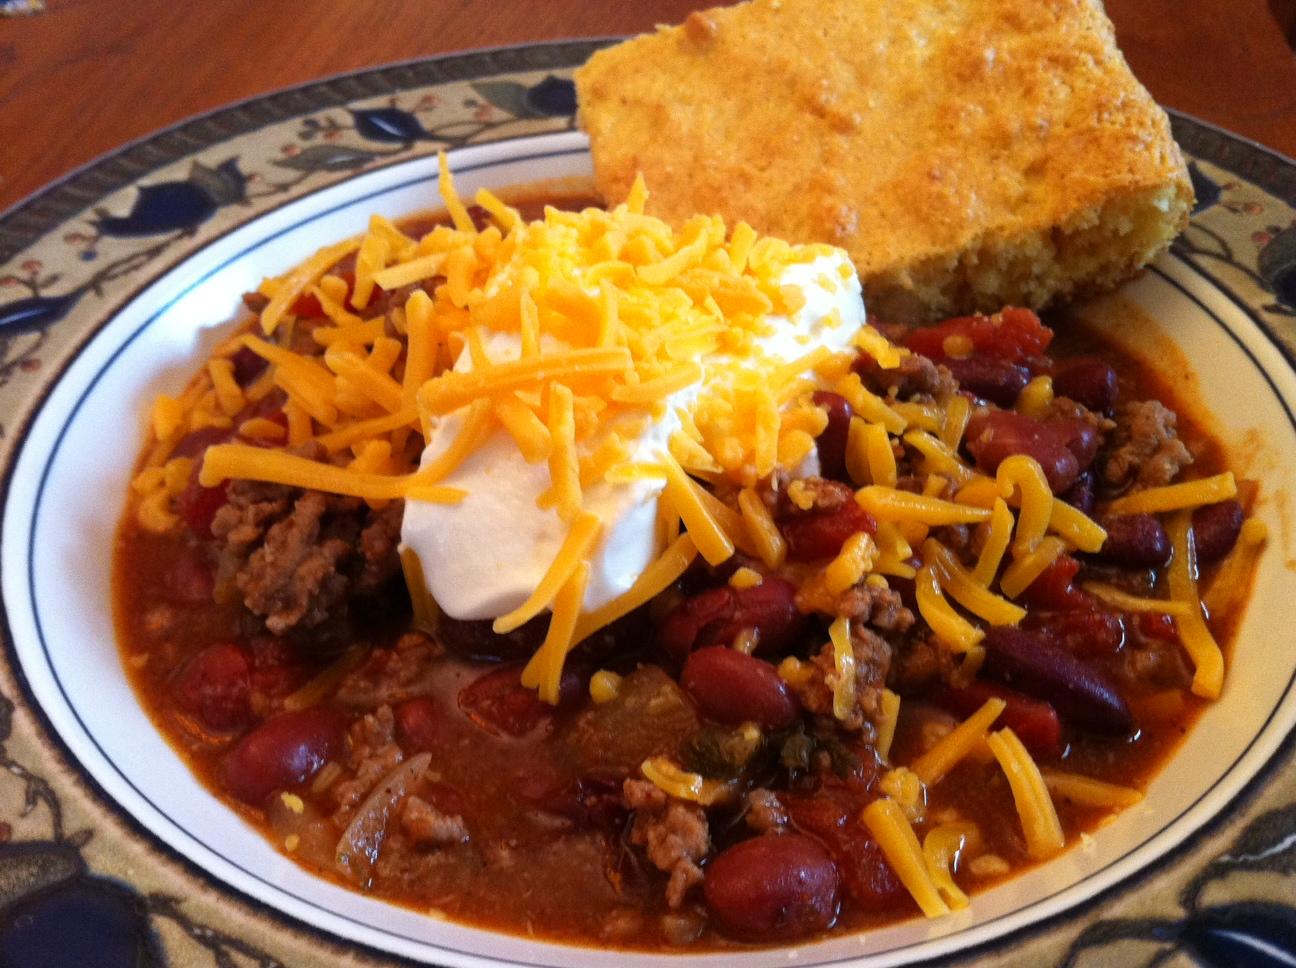 30 MINUTE CHILI & CORNBREAD | Food/Snacks & Recipes | Pinterest